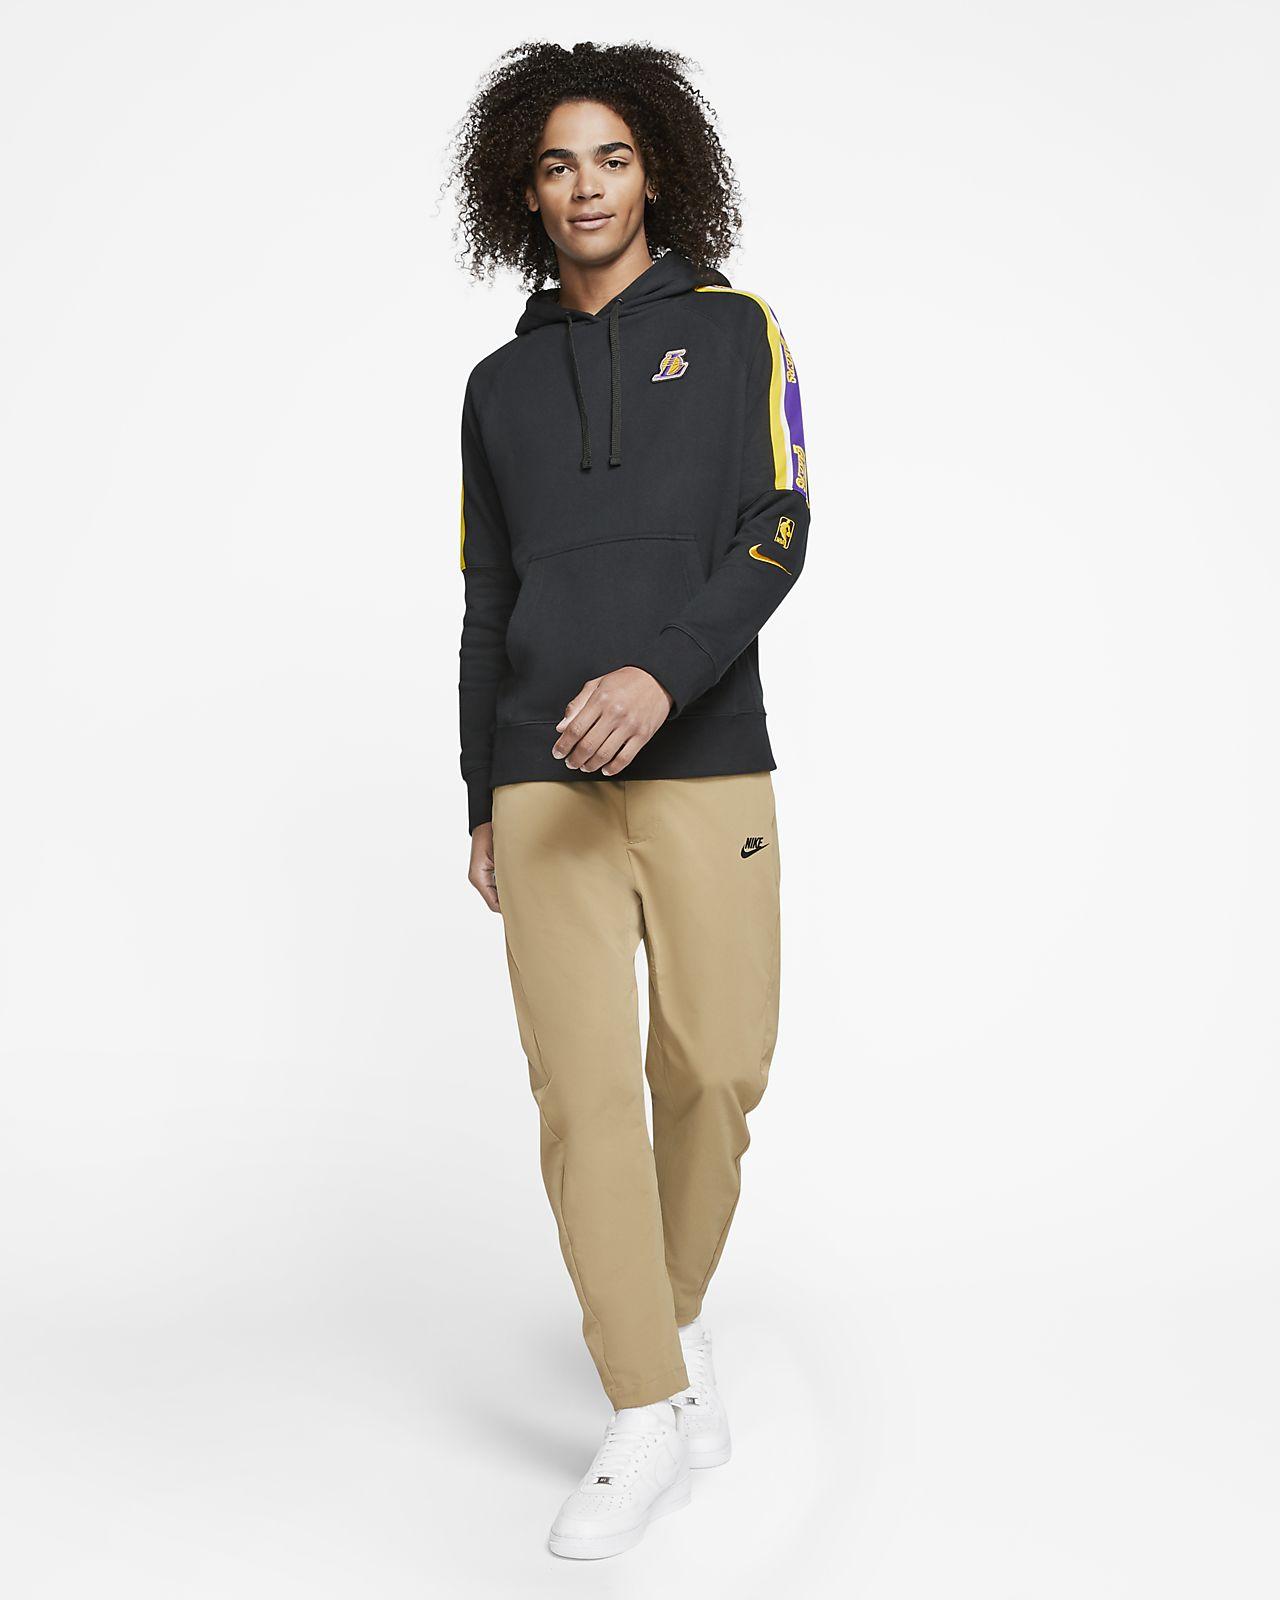 Nike Golden State Warriors Courtside Warm Up Jacket | Nordstrom